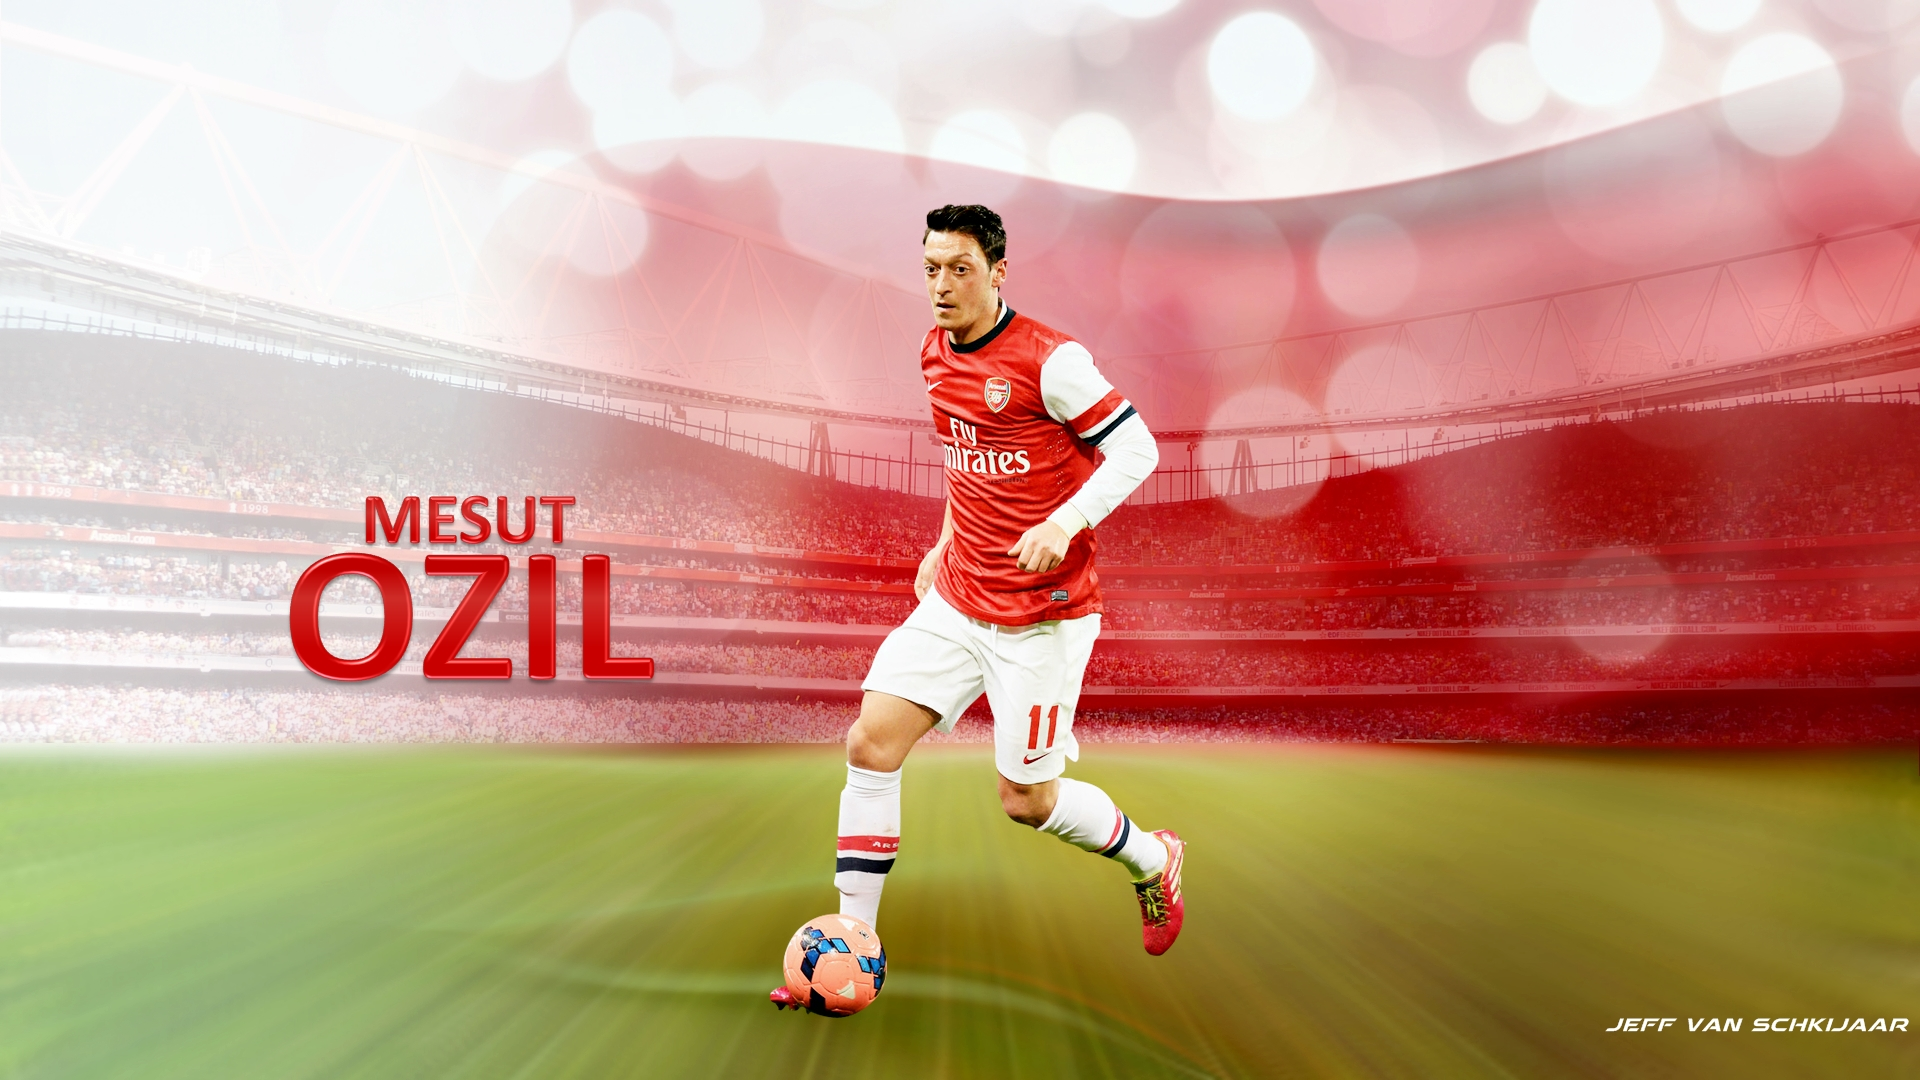 Mesut Ozil Arsenal Wallpaper HD 2014 2 Football 1920x1080